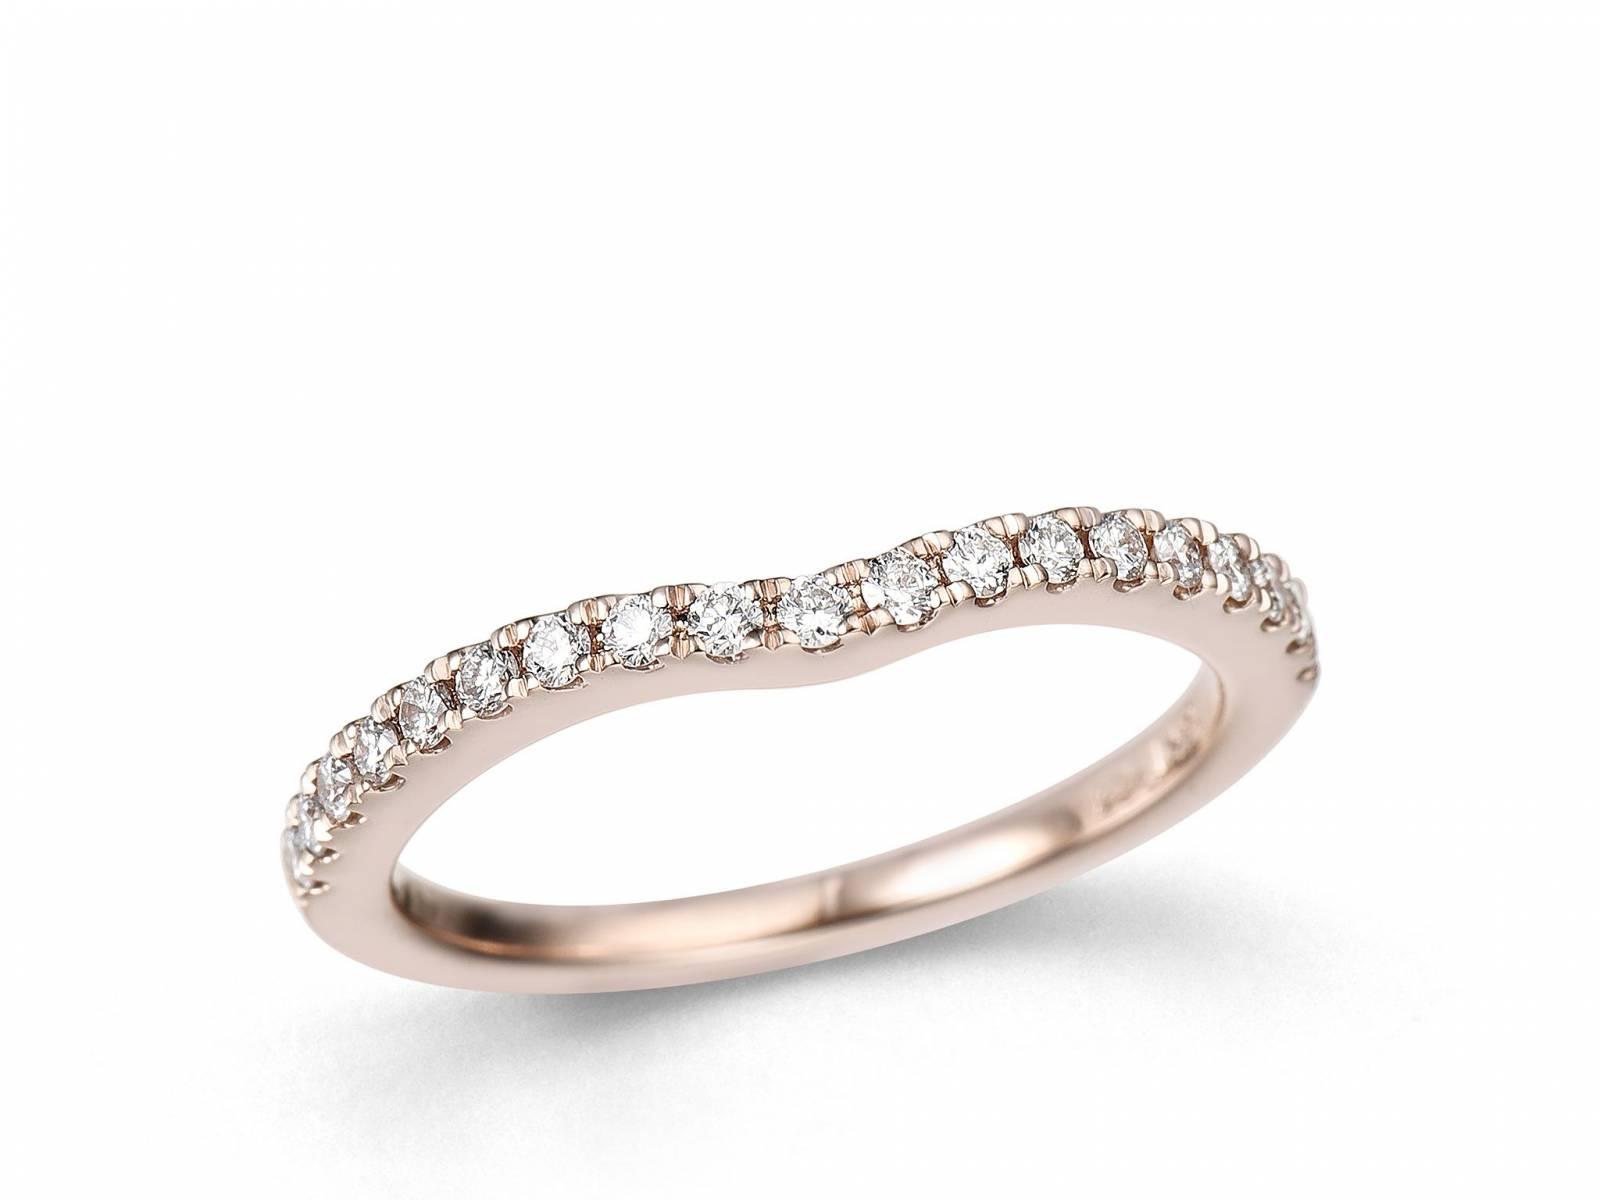 Gilson - Juwelen - Bruidsjuwelen - Trouwring - Verlovingsring - House of Weddings - 5